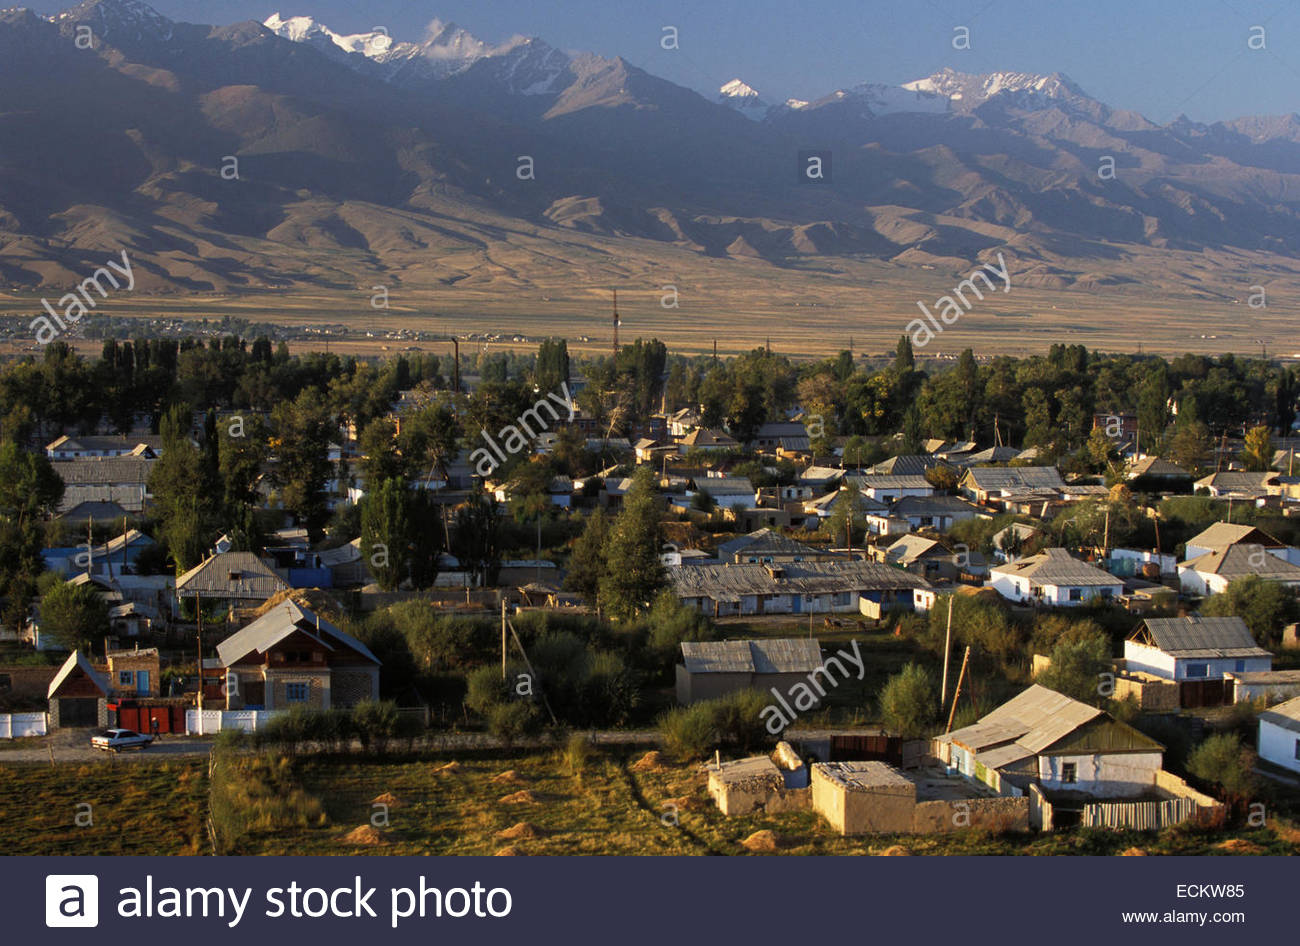 Kyrgyzstan, Village of Naryn. - Stock Image